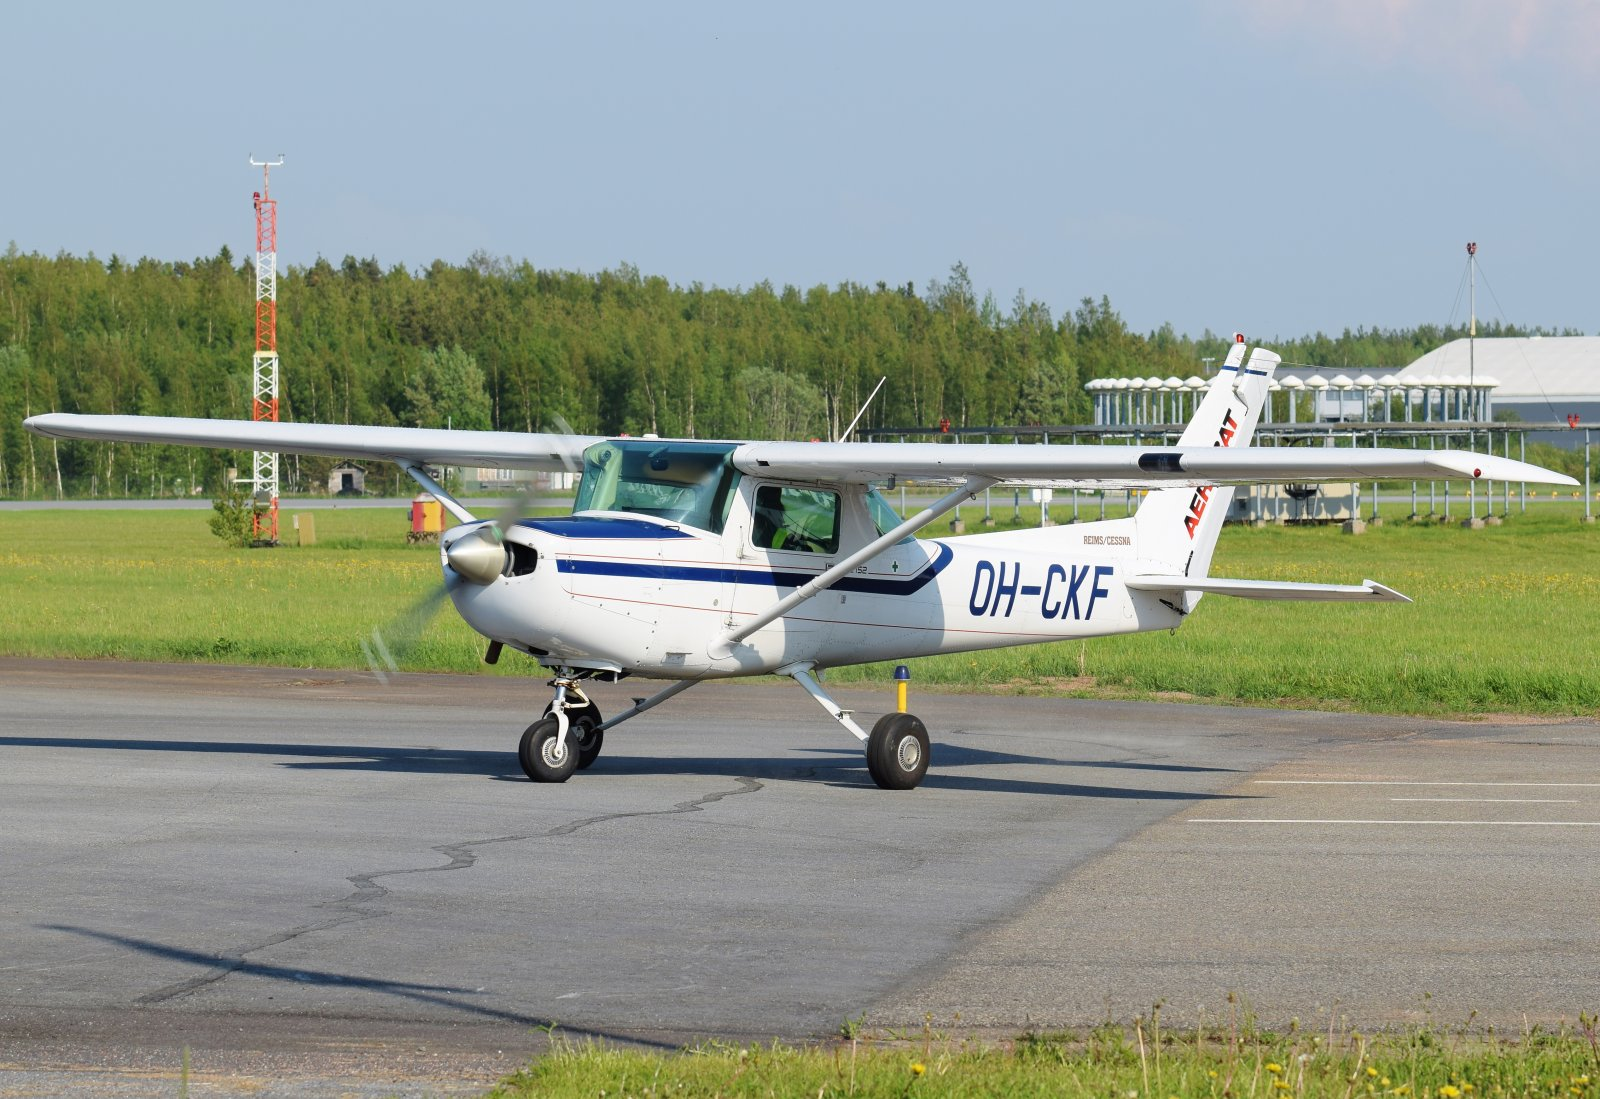 OH-CKF - Reims-Cessna FA152 Aerobat - Suomen Ilmailuopisto - 6.6.2019